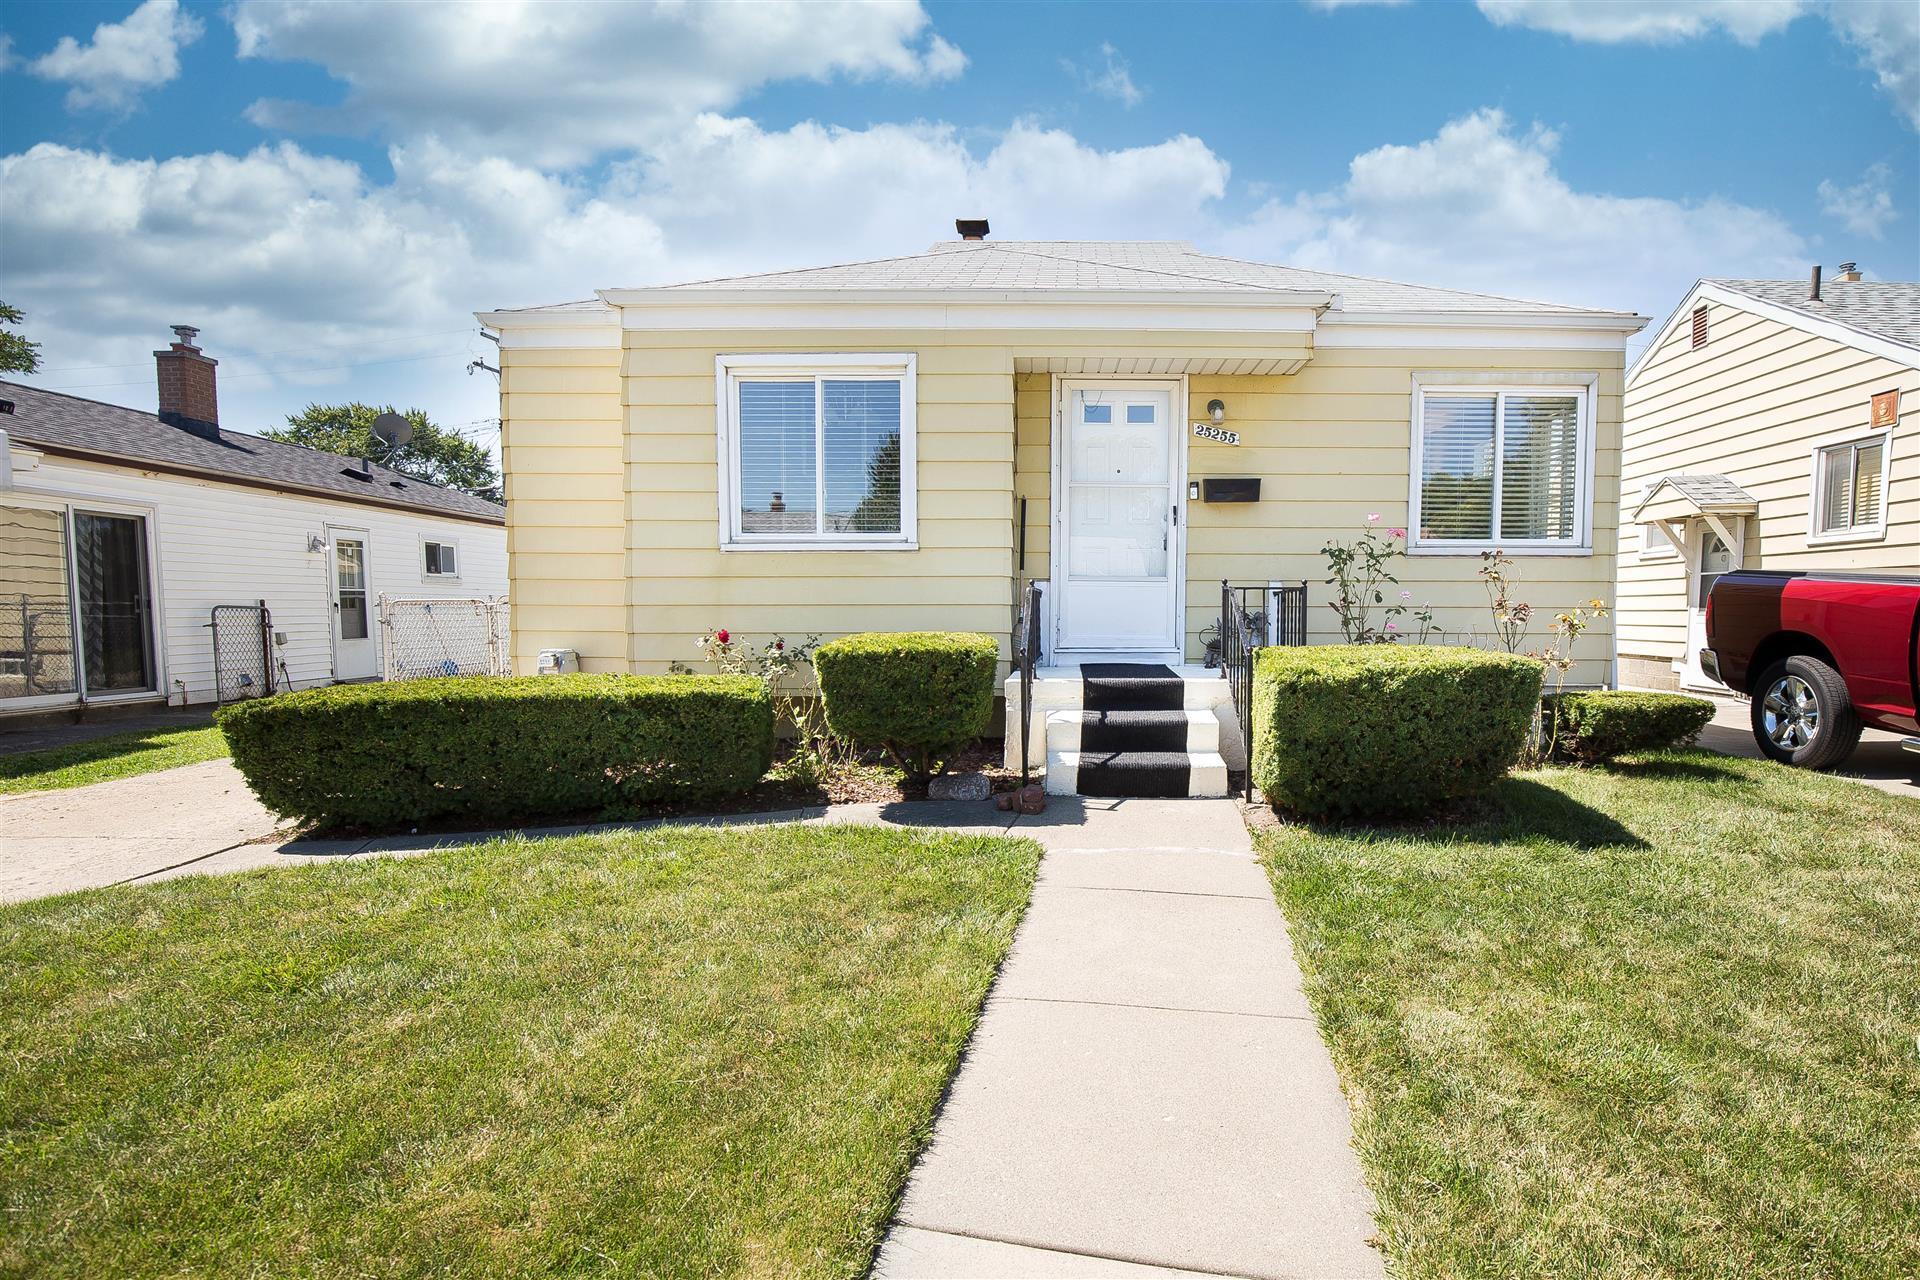 FOR SALE – Commercial Property – 25985 Groesbeck Hwy in Warren $350,000